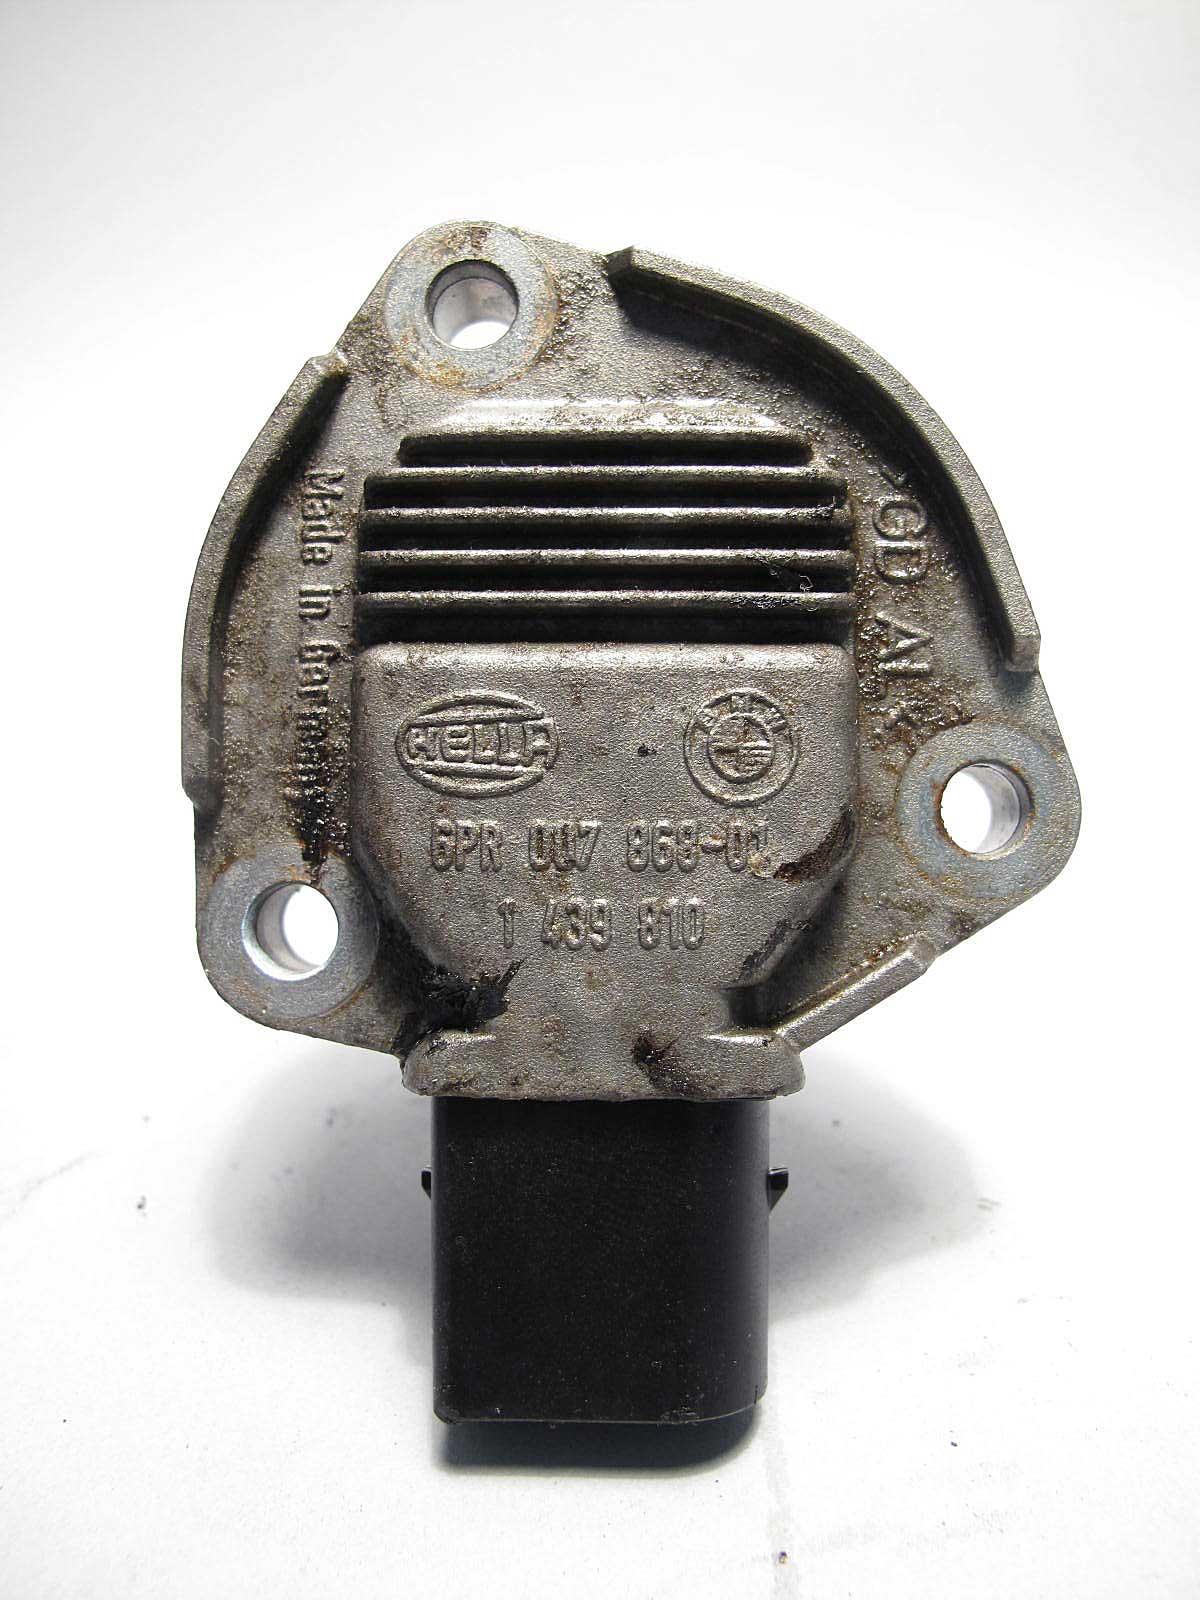 1998 2006 Bmw Oil Pan Level Sensor Sender E38 E39 E46 X3